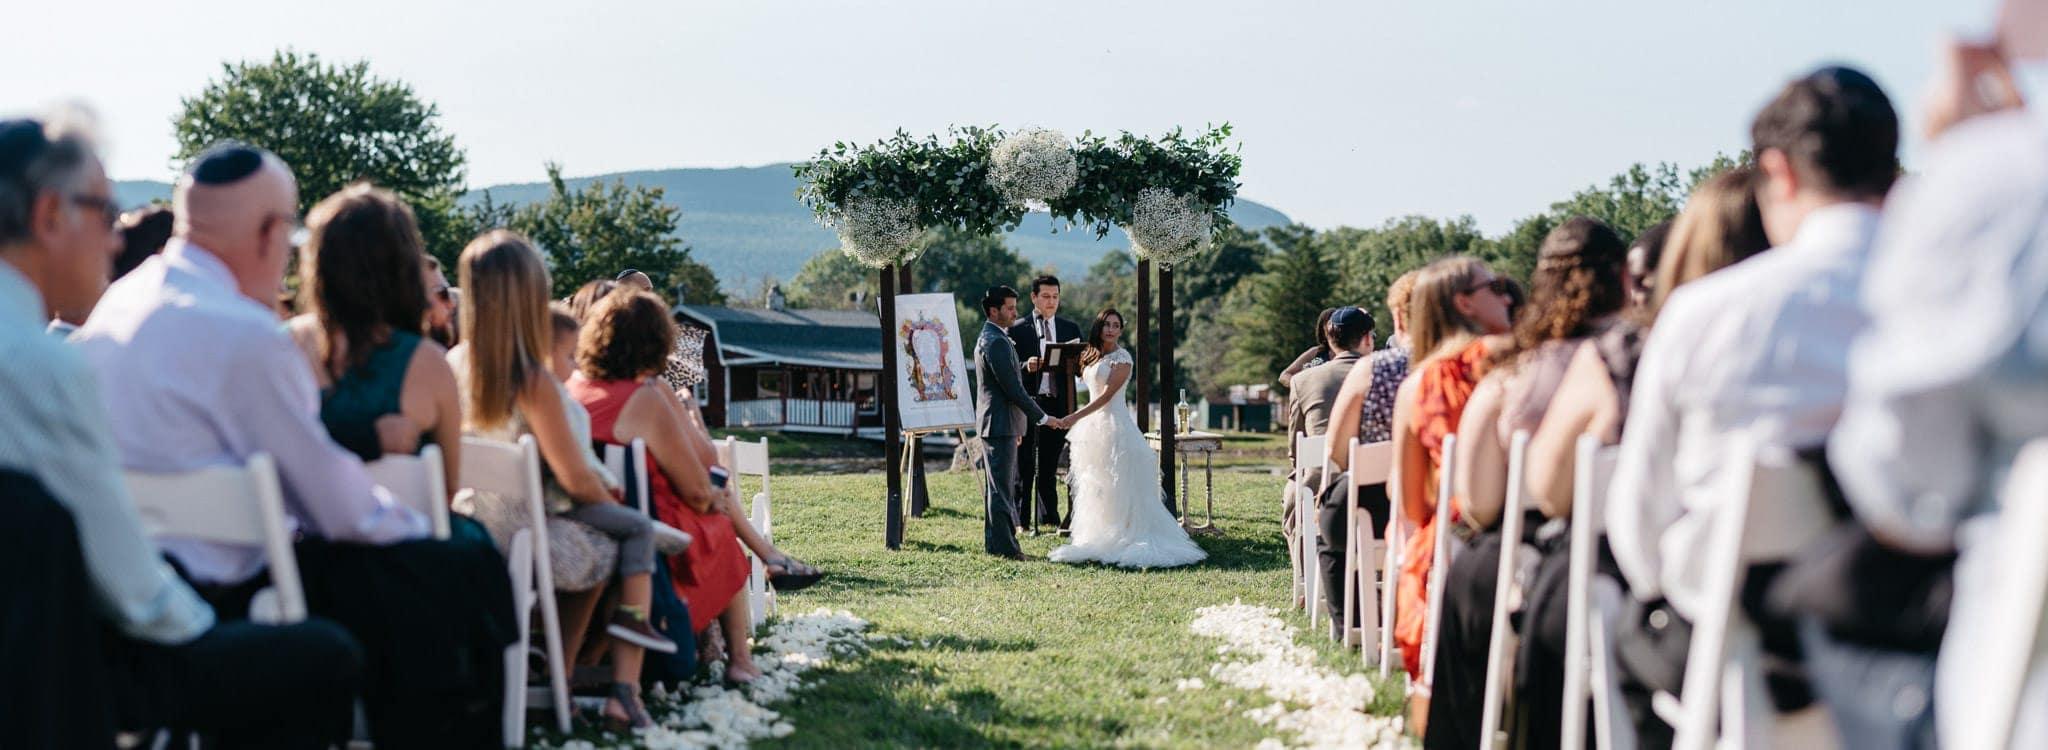 the-kaaterskill-wedding-photos-36